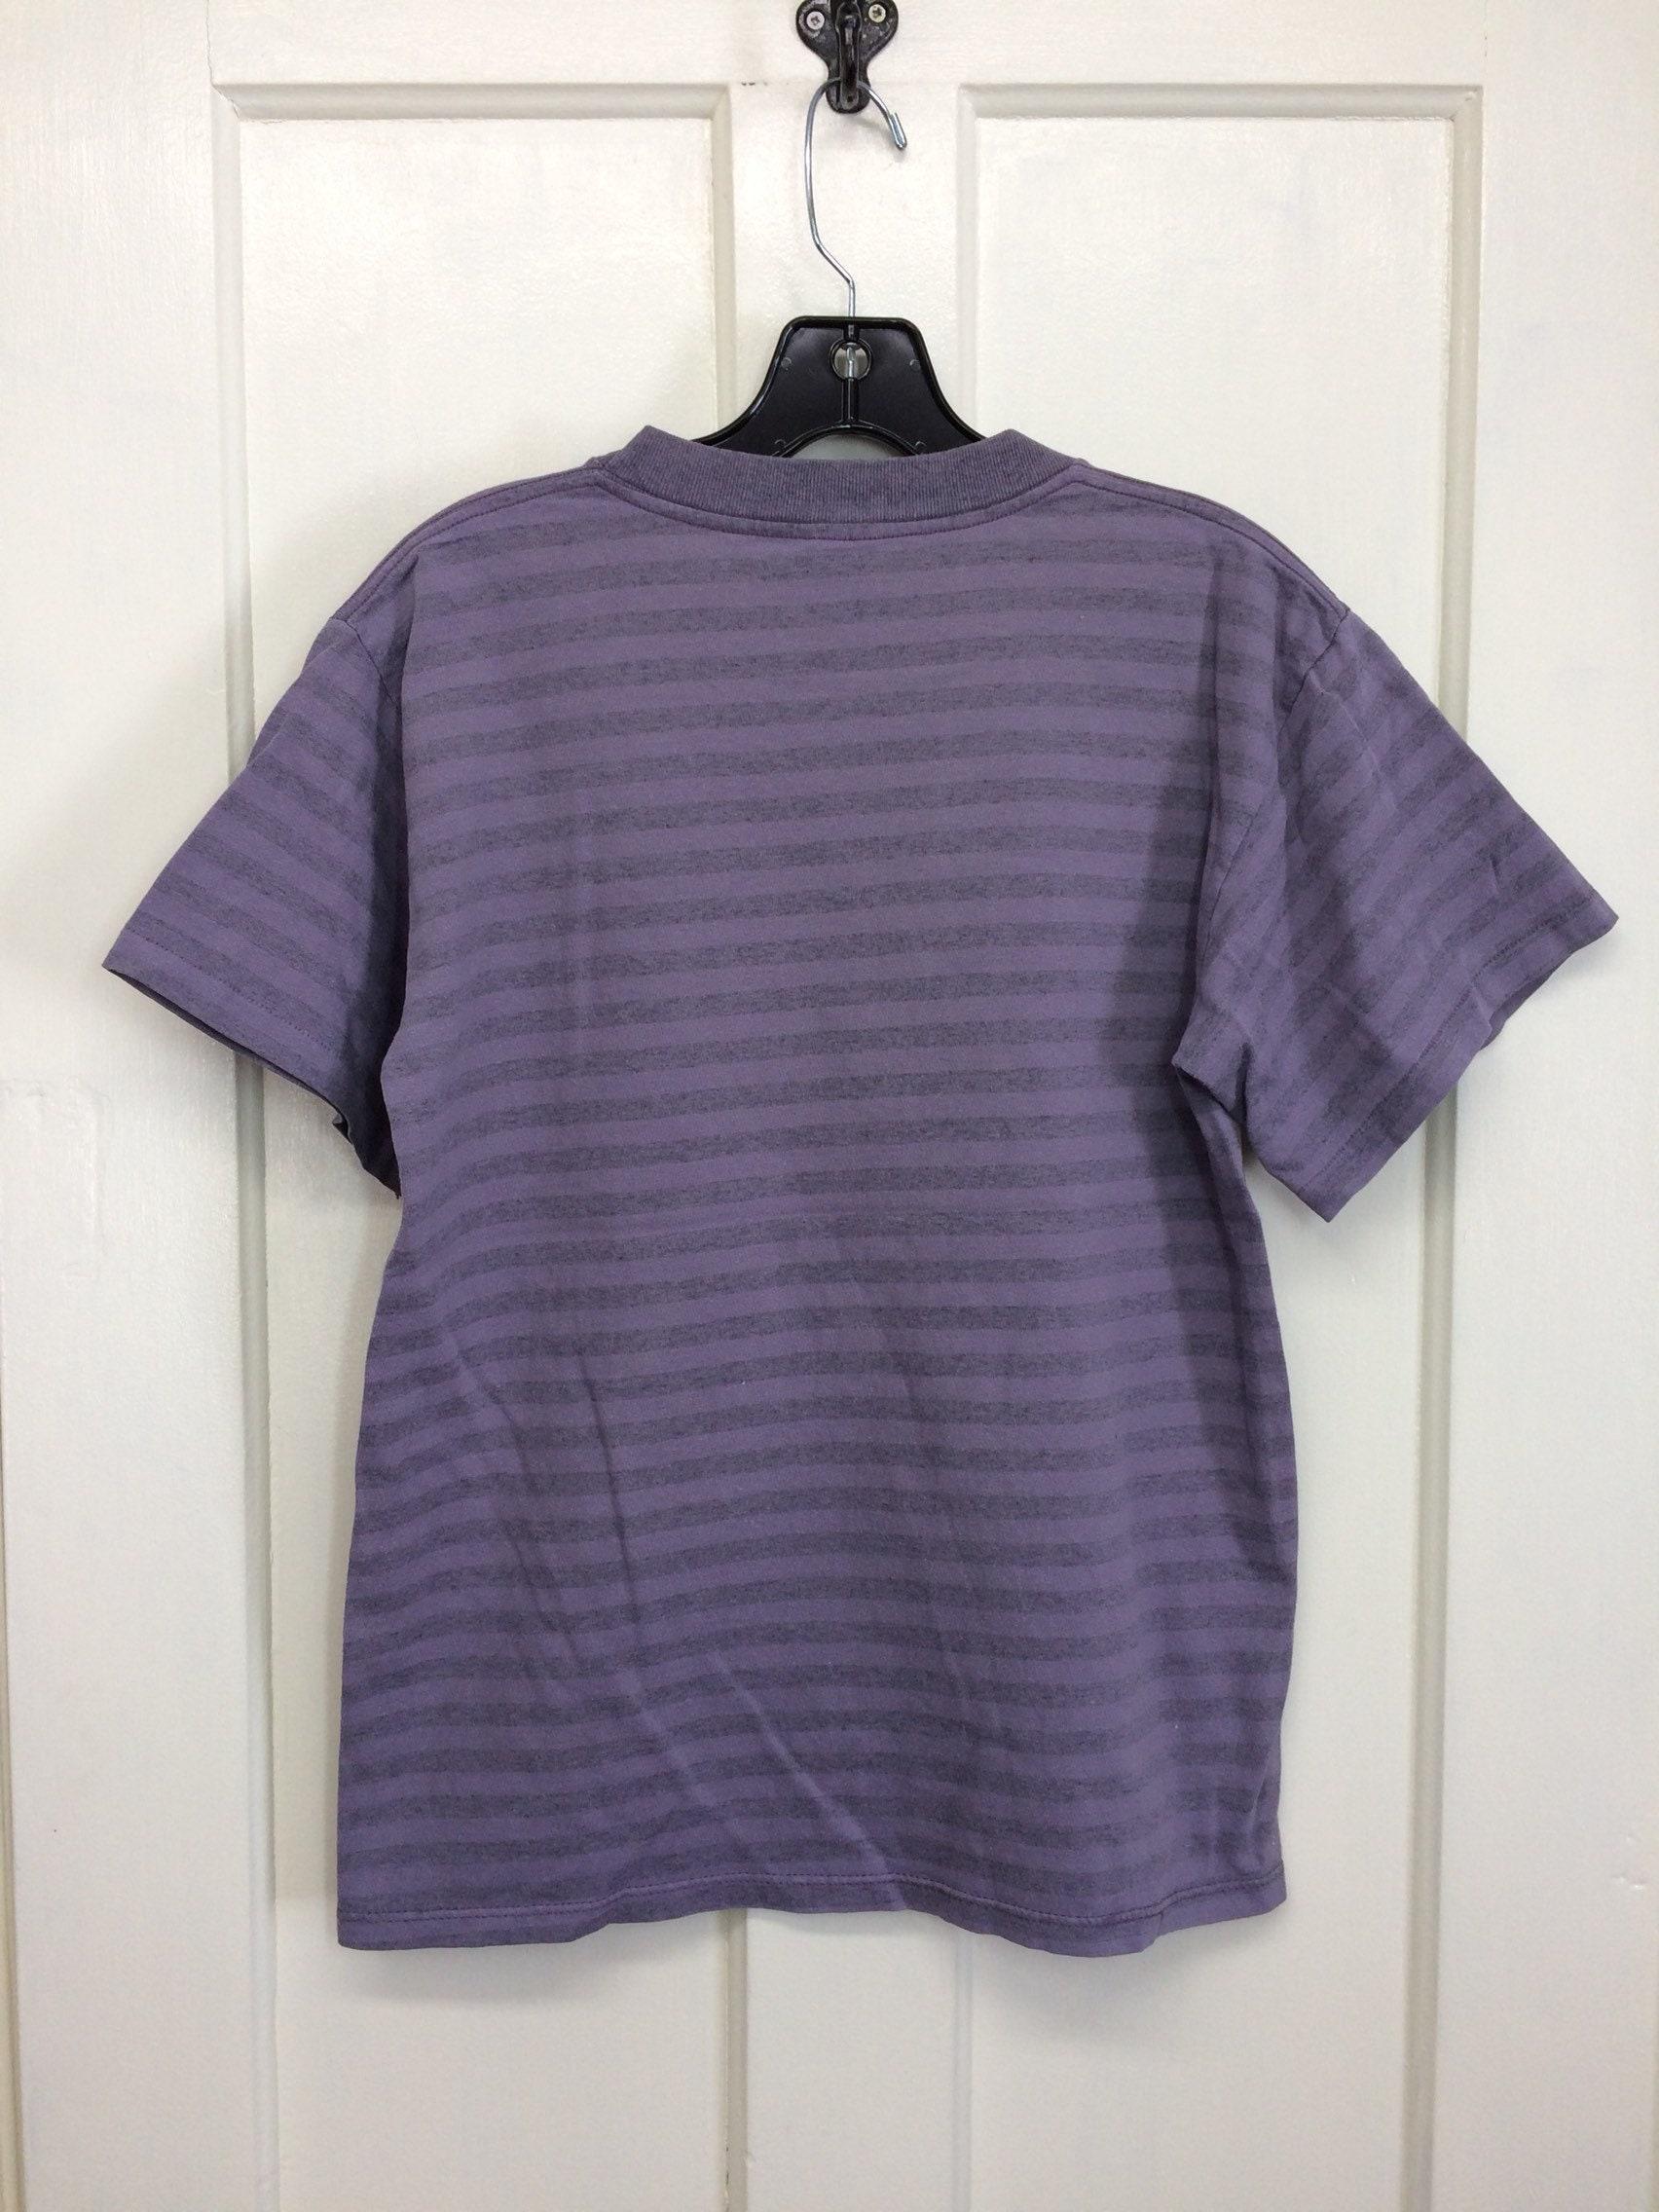 abb031421fa3 Guess Jeans Striped T Shirt